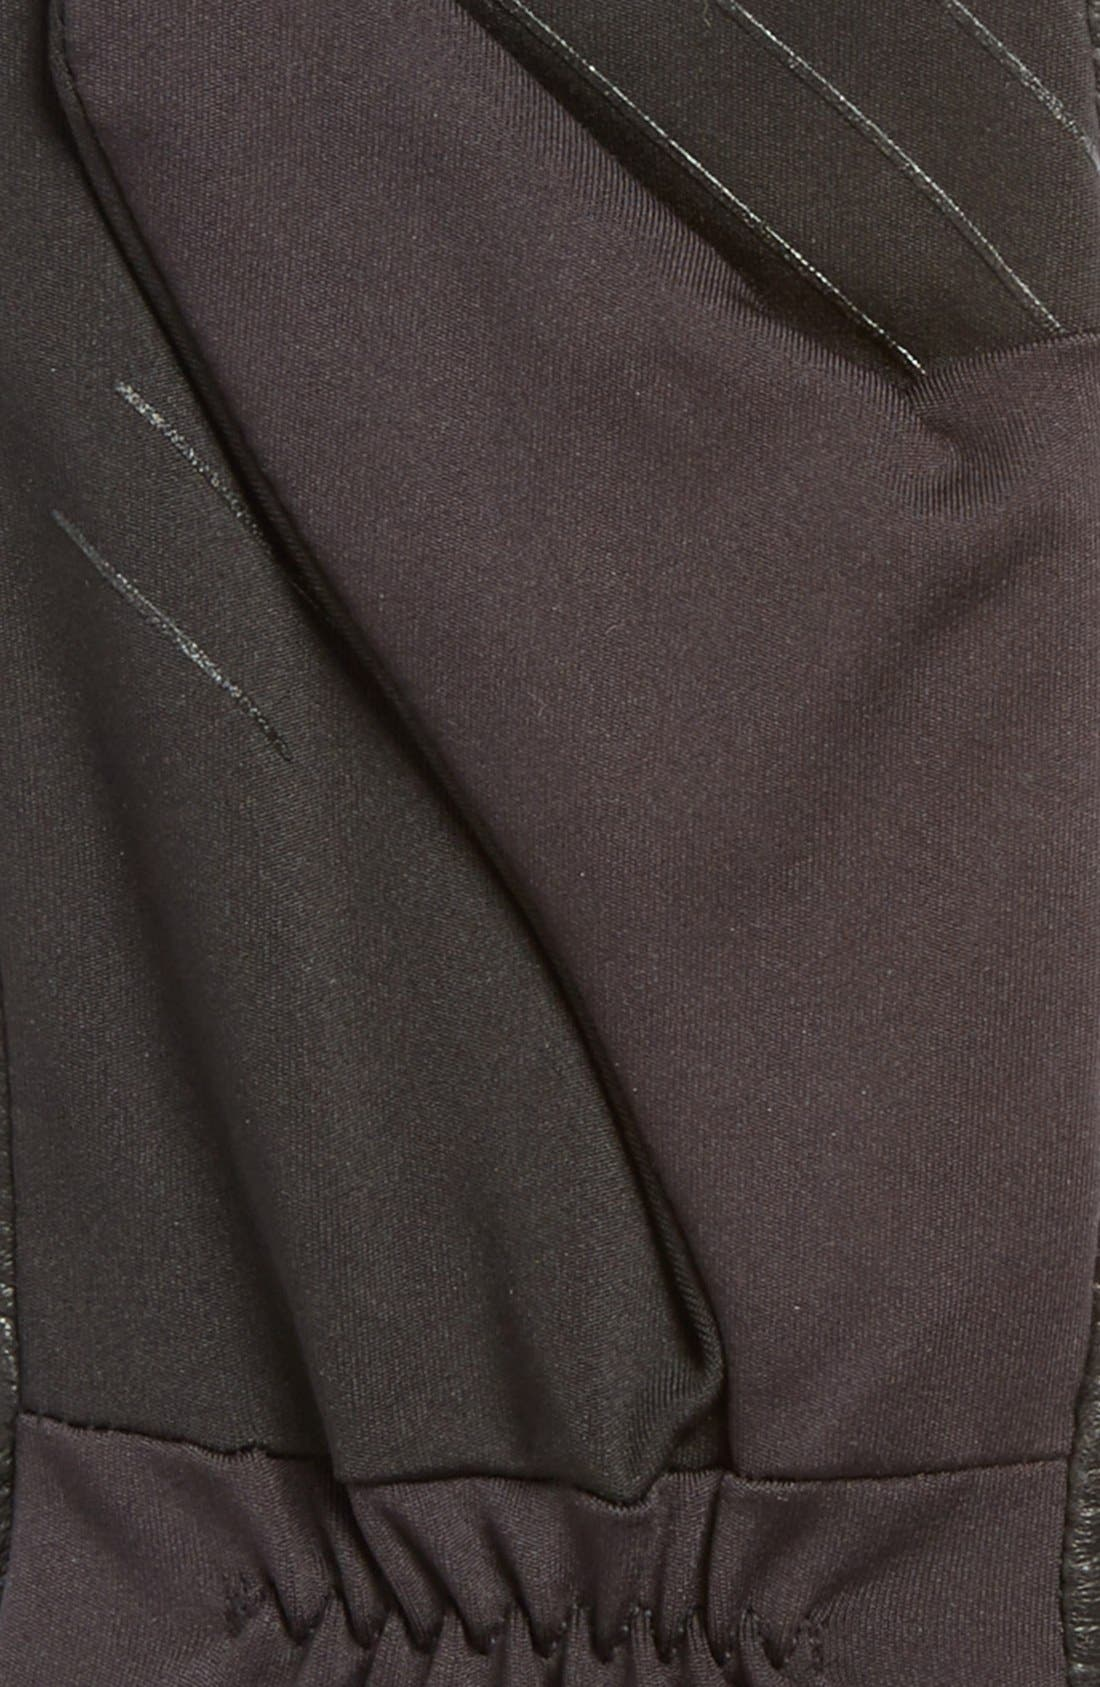 Leather Tech Gloves,                             Alternate thumbnail 3, color,                             001